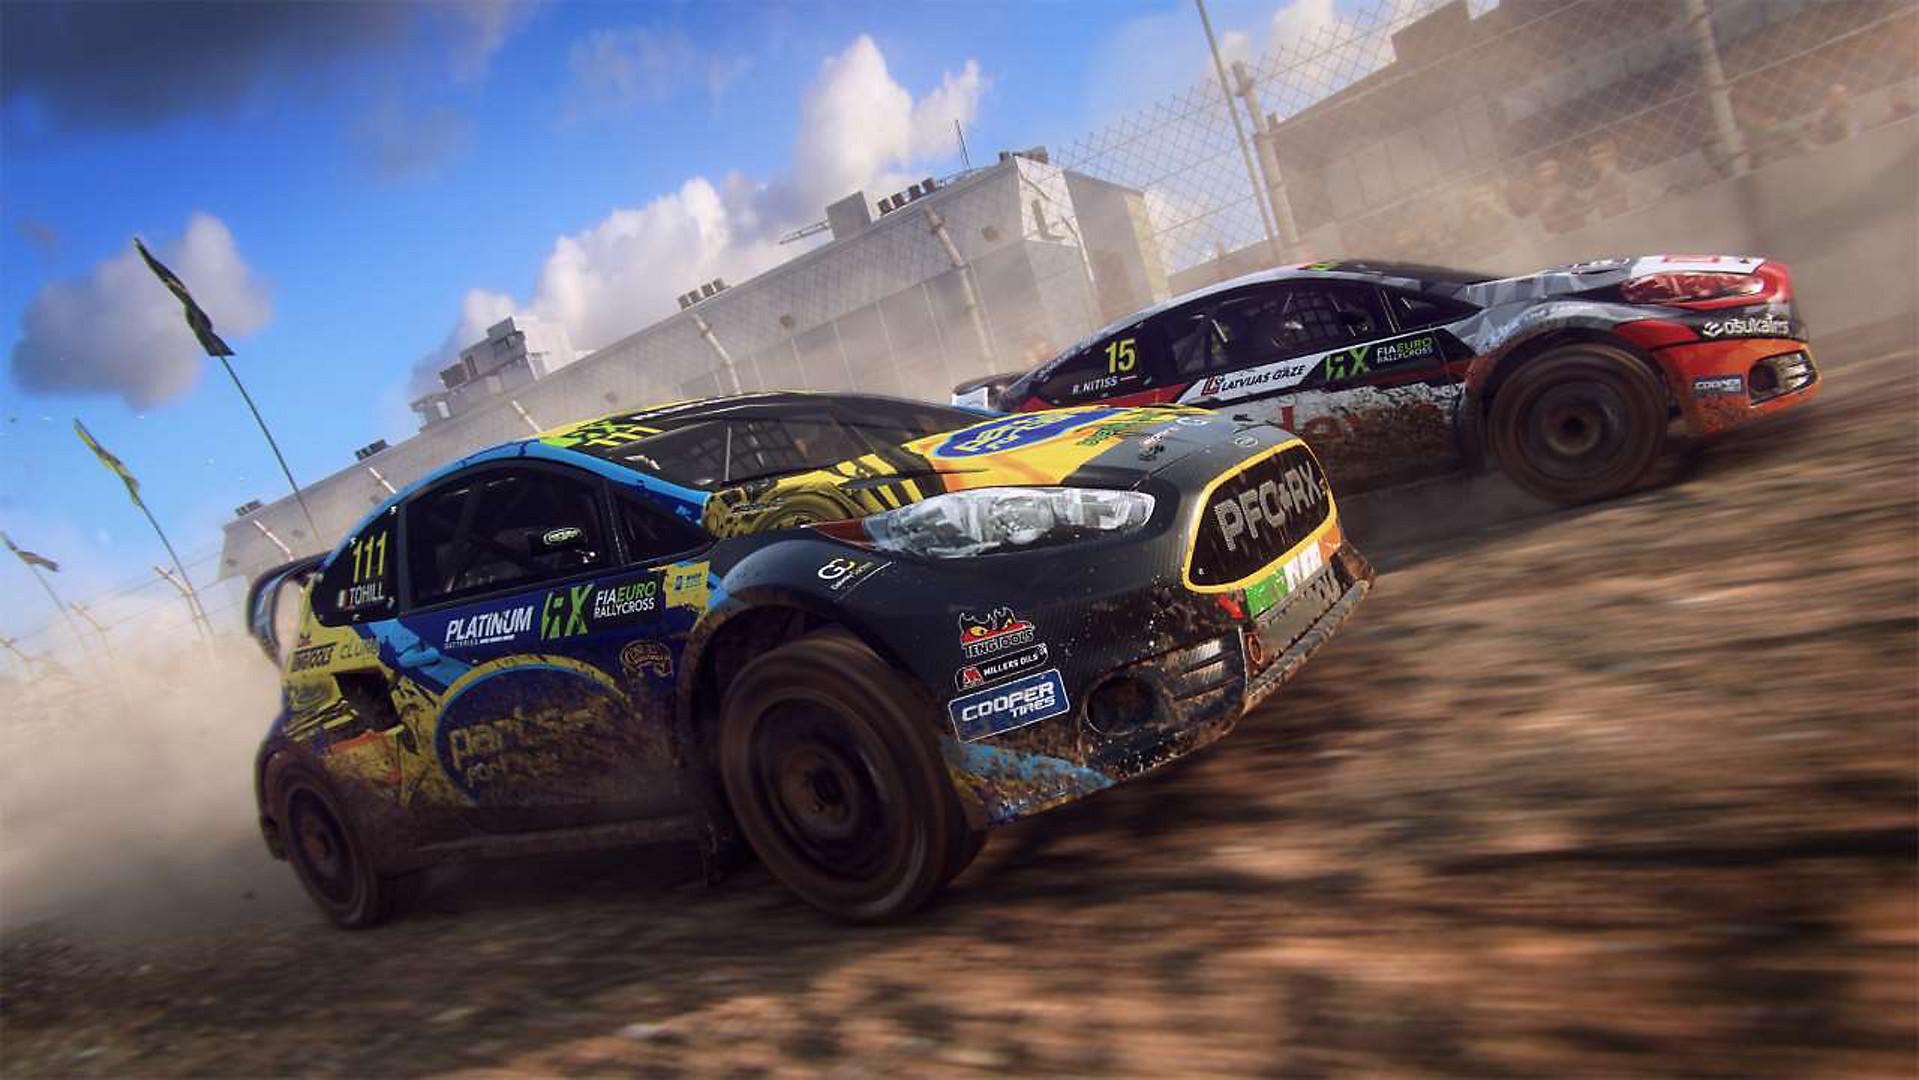 dirt-rally-20-screenshot-04-ps4-us-22feb